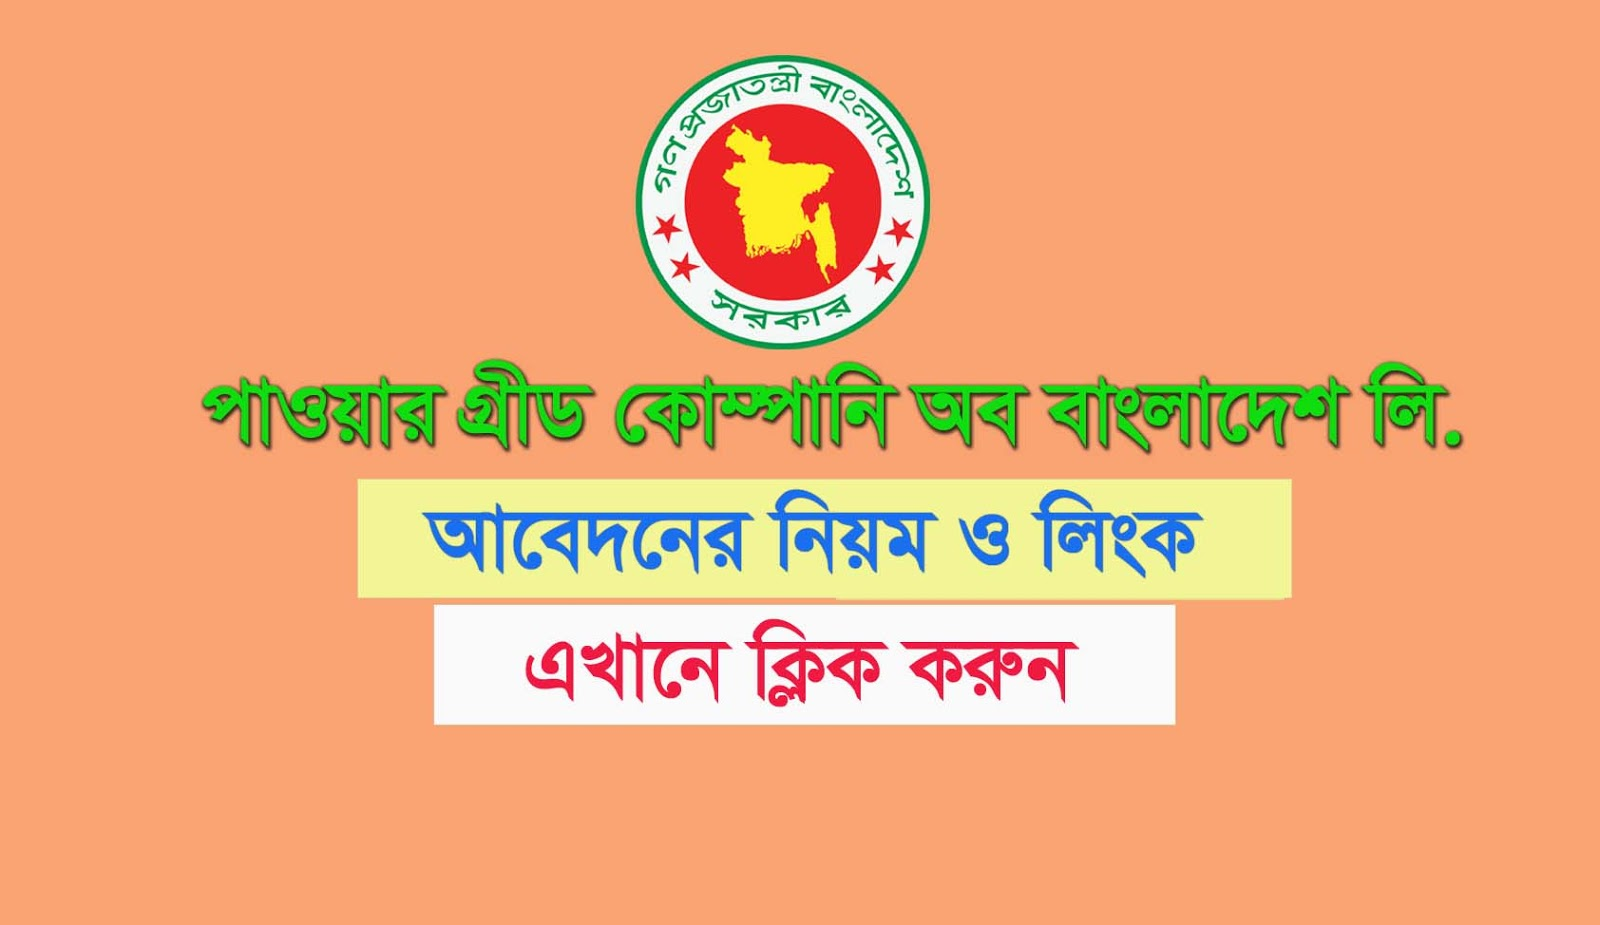 Power-Grid-Company-of-Bangladesh-Ltd-job-circular